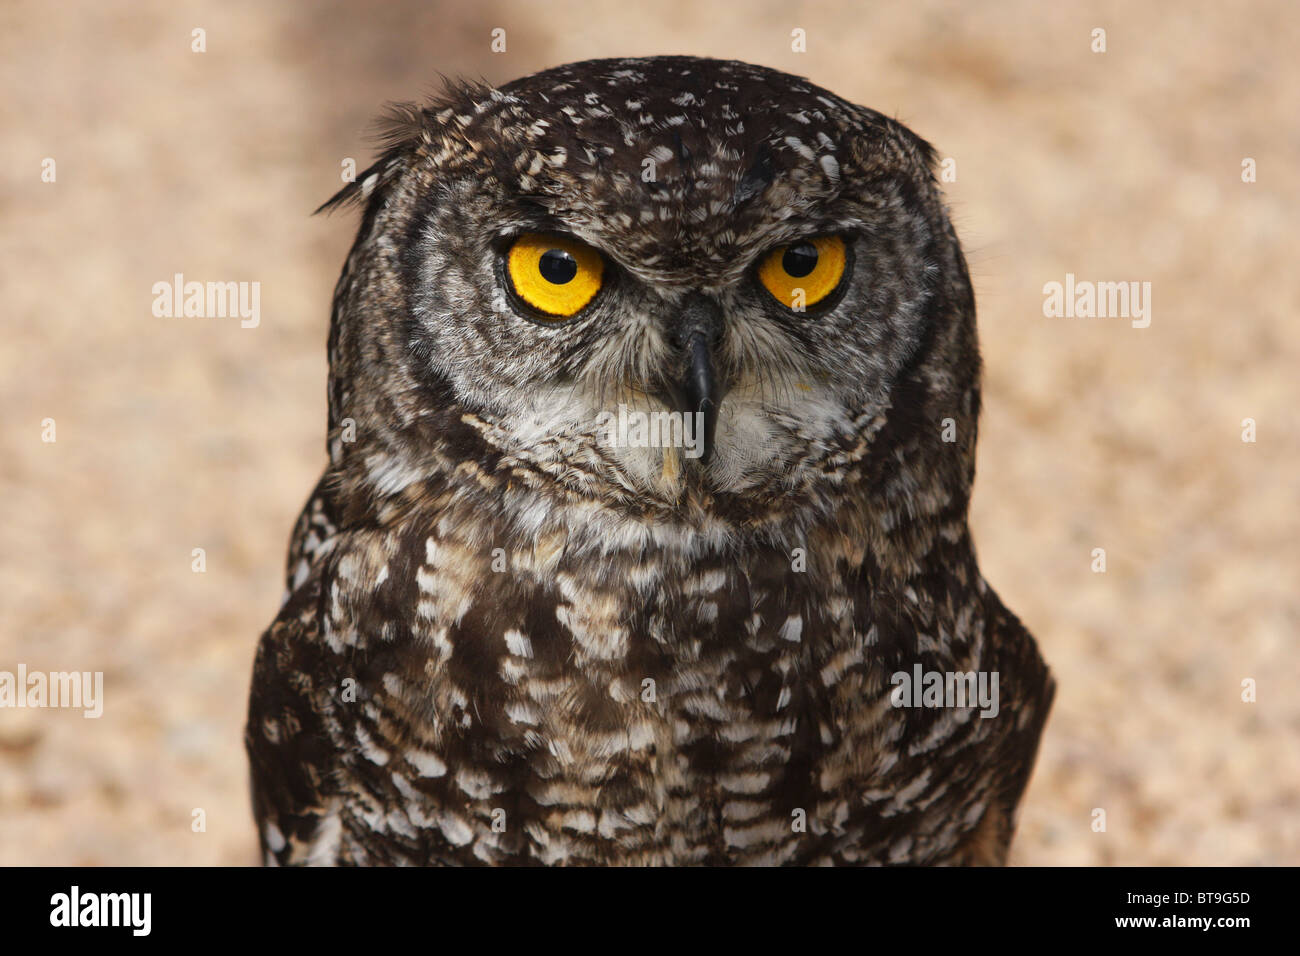 awl, south Africa, young, bird - Stock Image